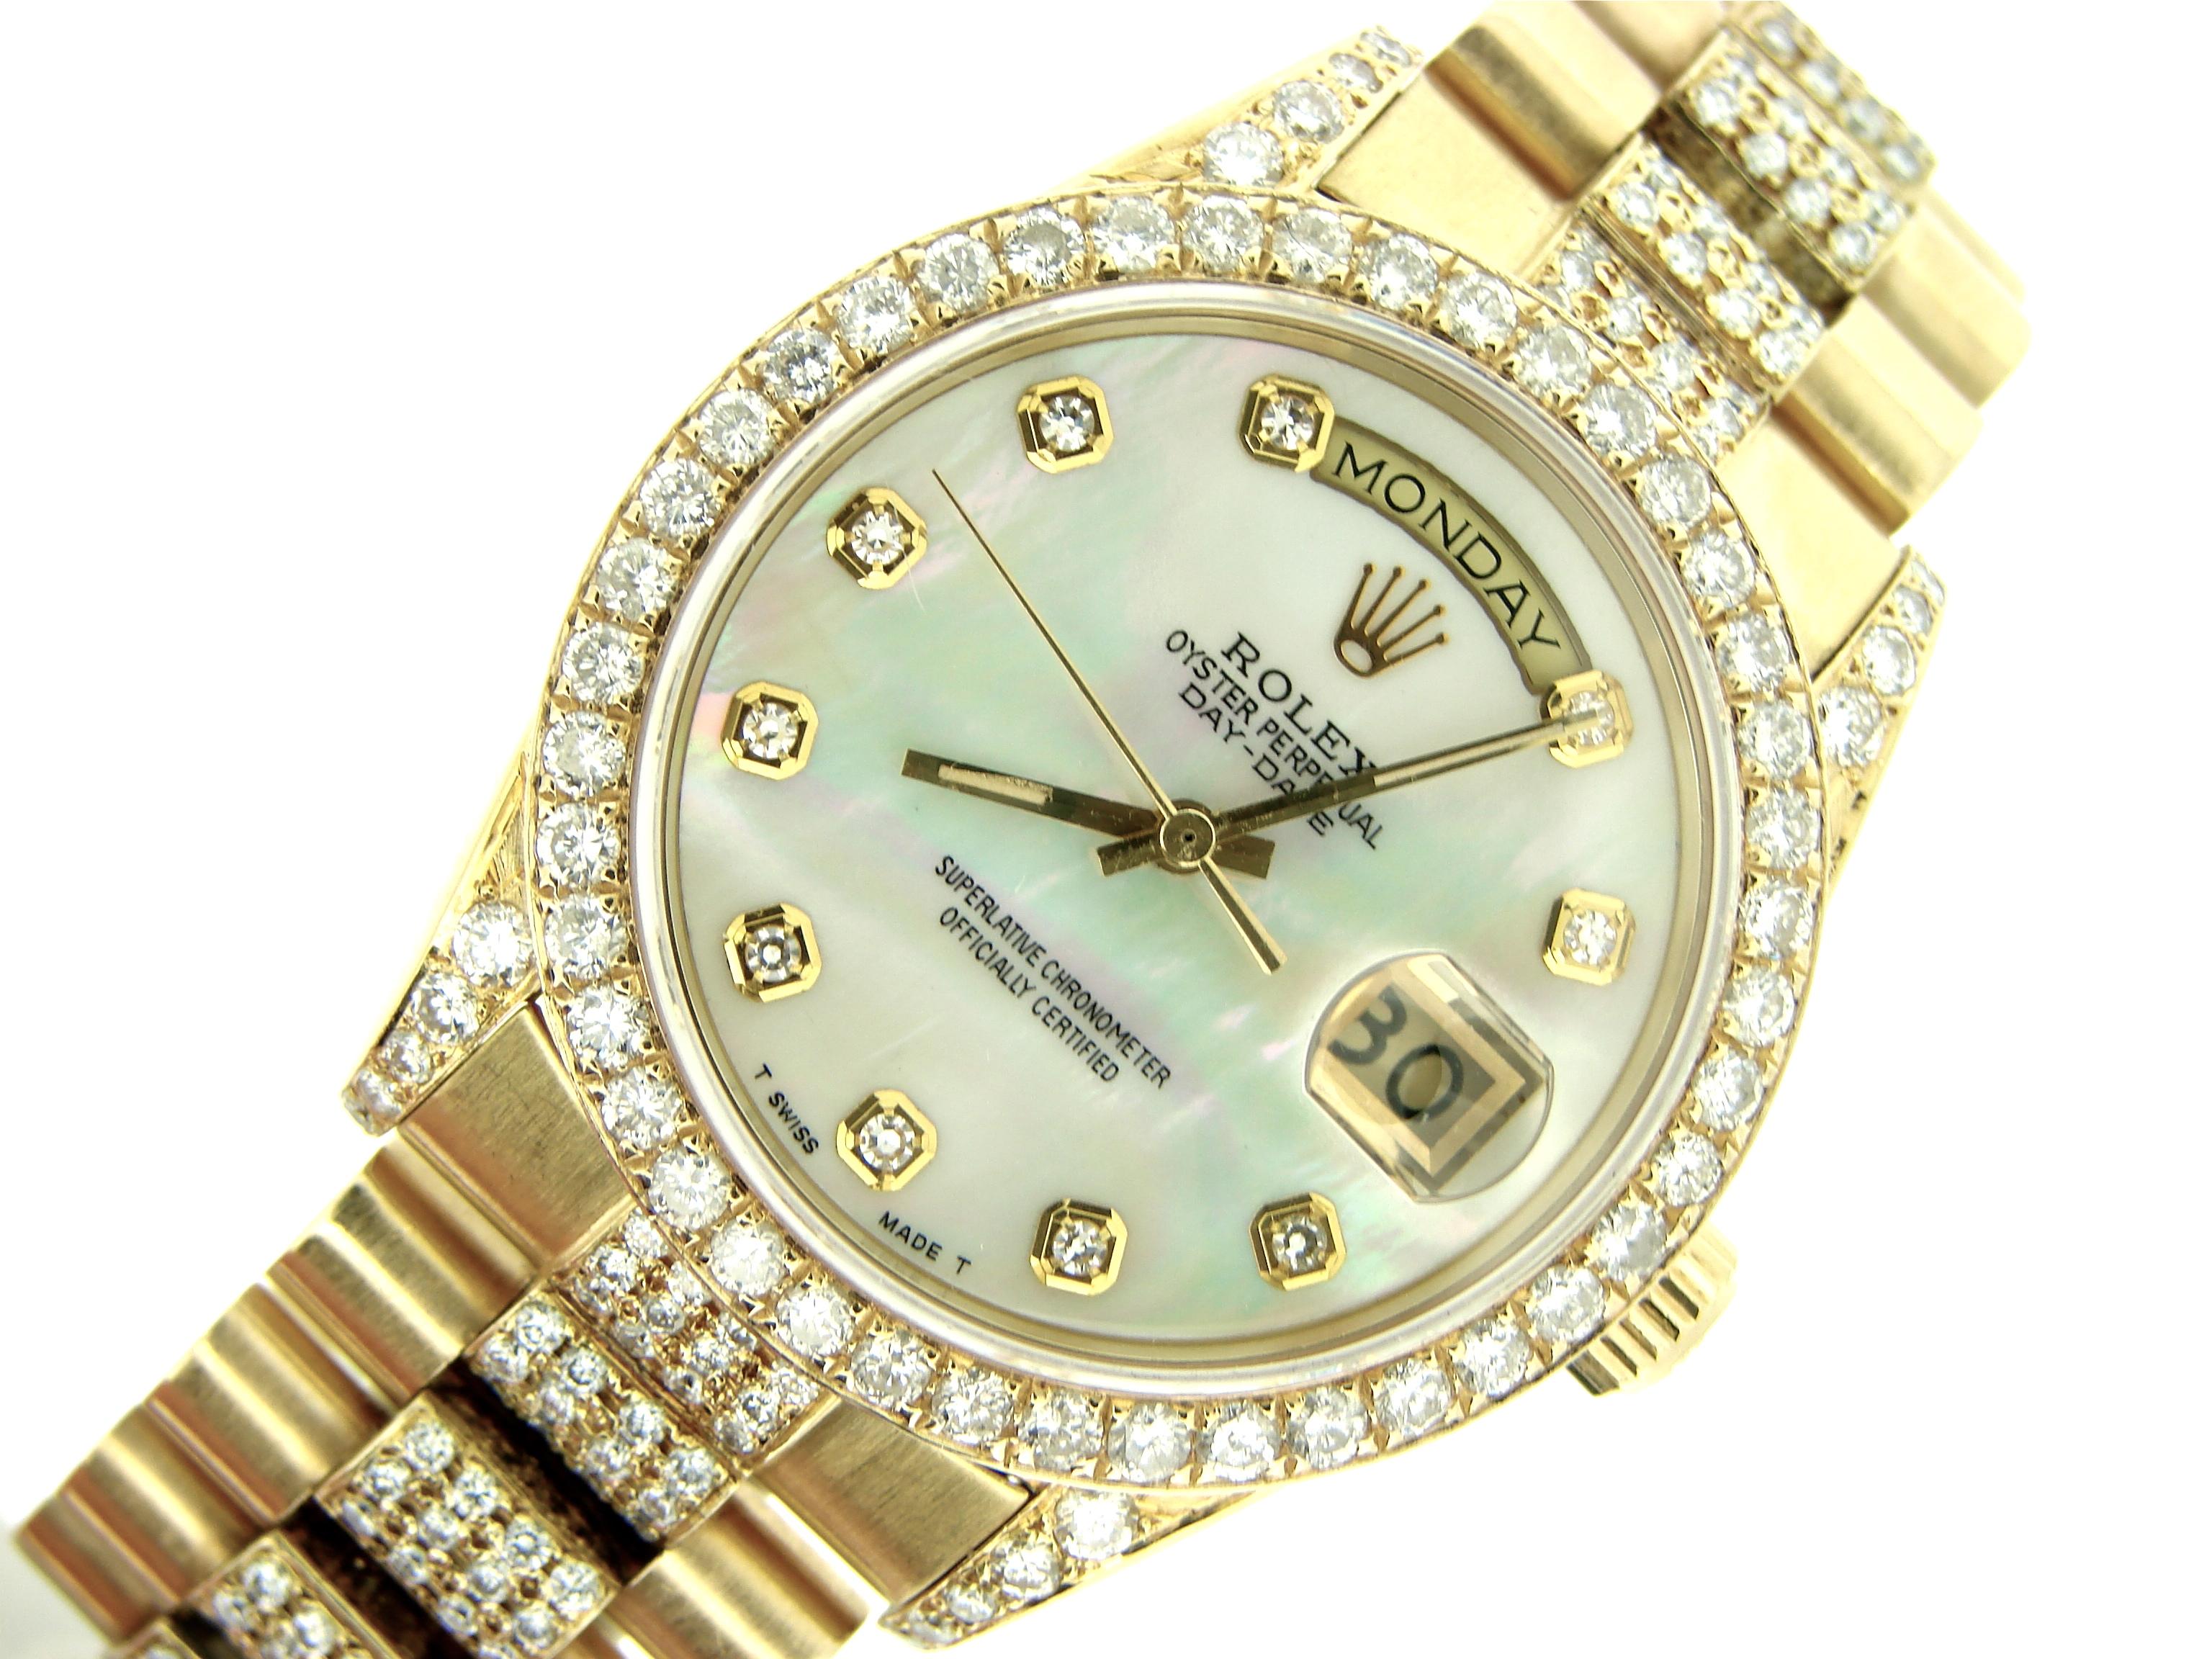 Мужские часы Day Date Presidential от Rolex с брильянтами